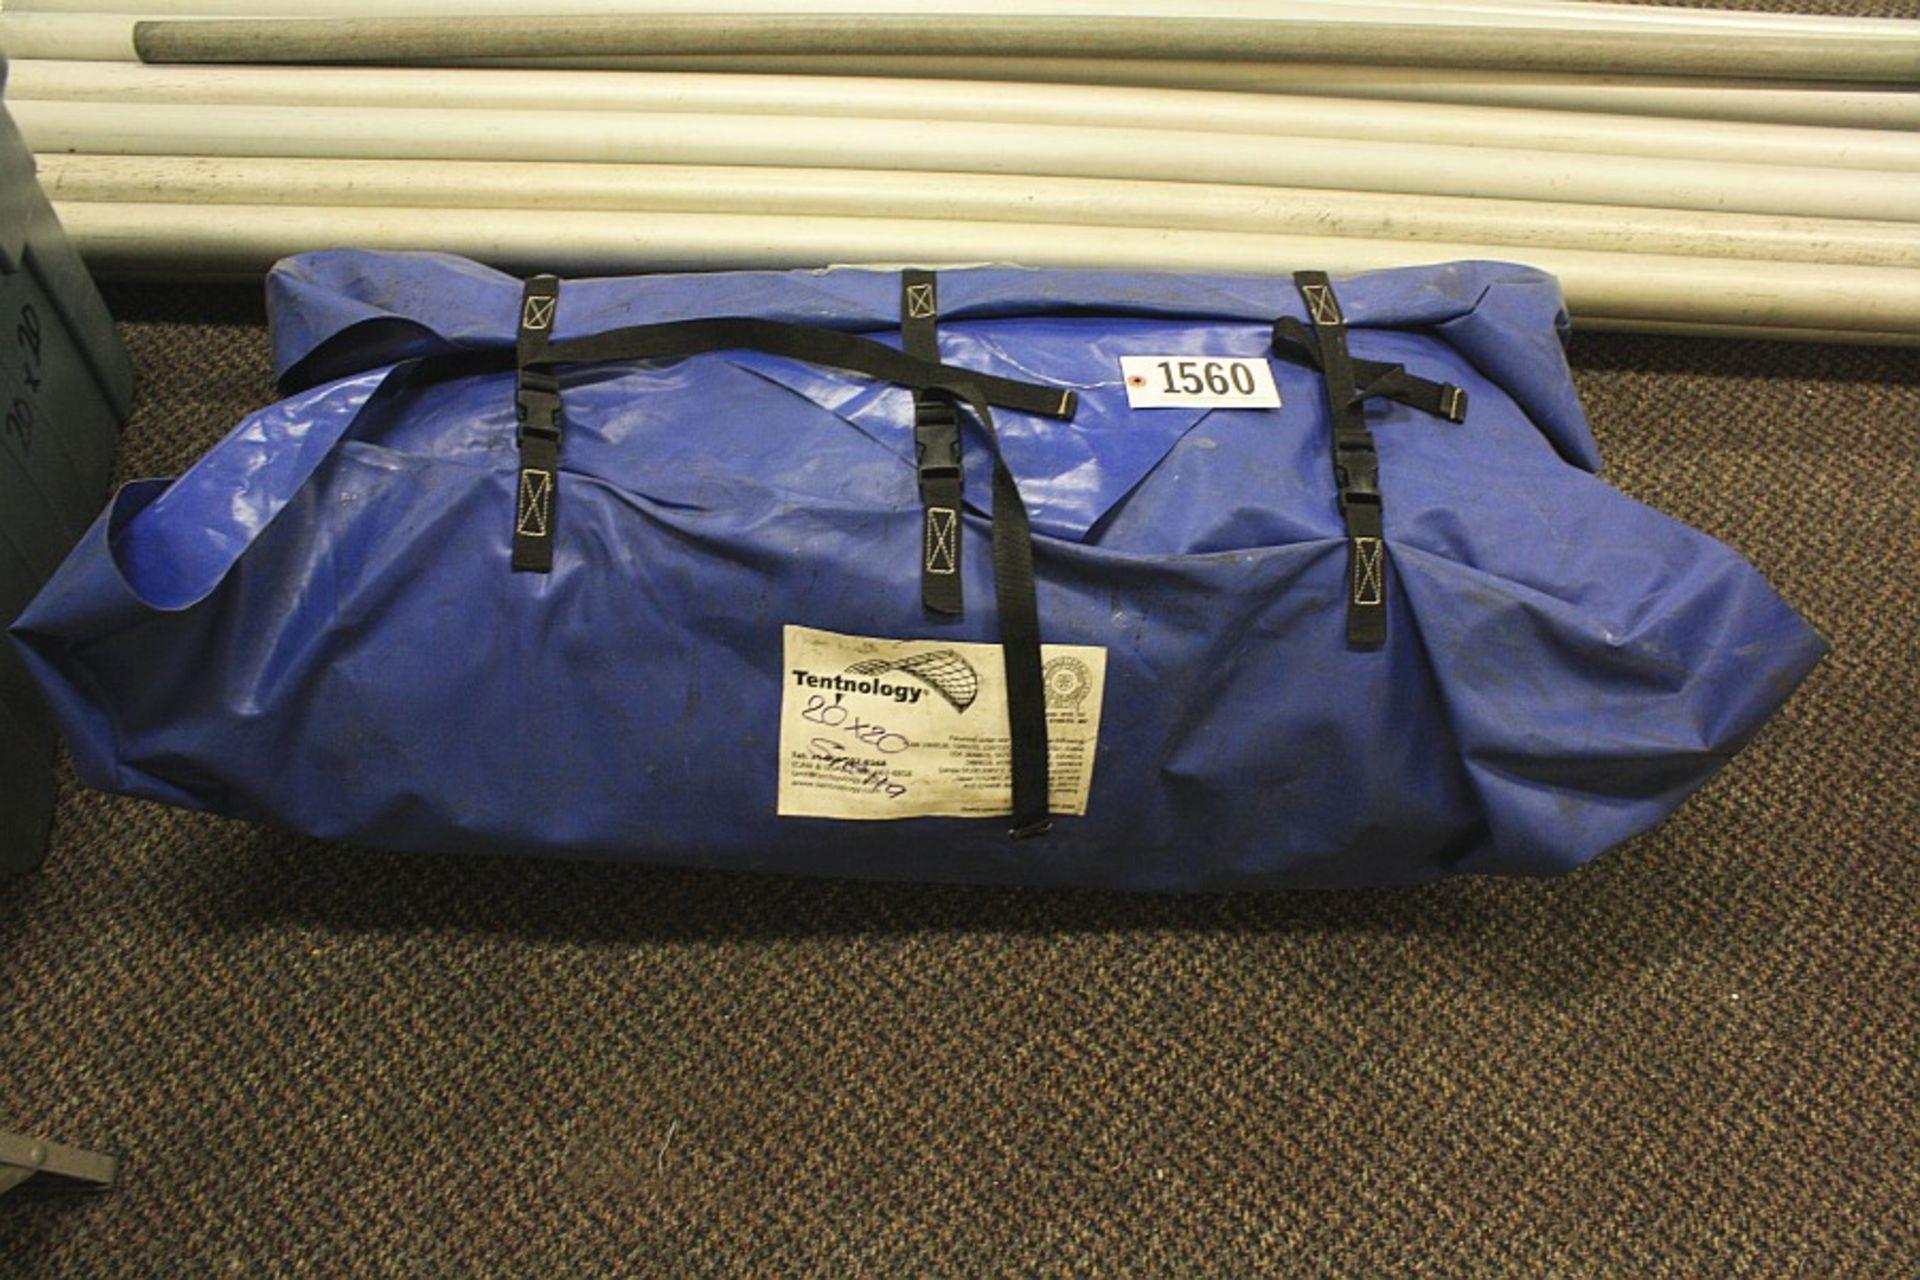 Lot 1560 - Tentnology Tent 20x20 Sierra